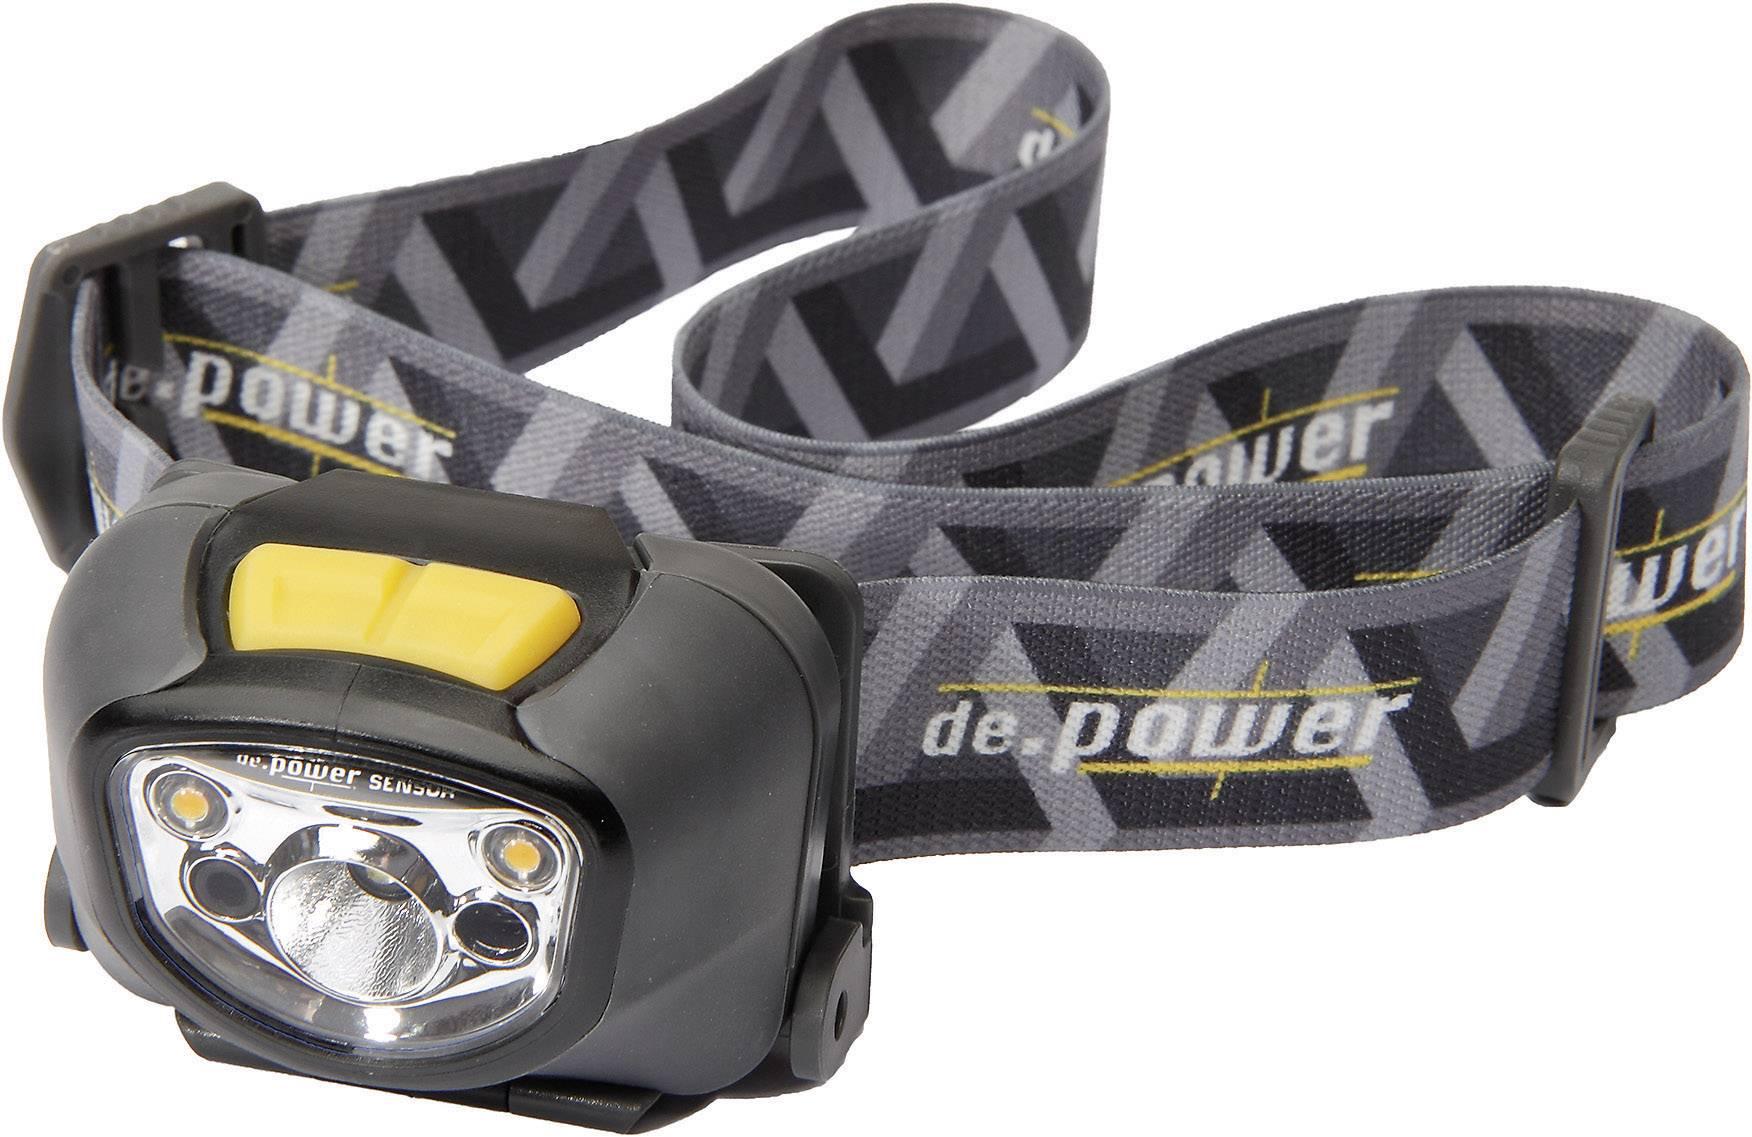 LED čelovka de.power by litexpress DP-802 DP-802AA, na batérie, 95 g, čiernosivá